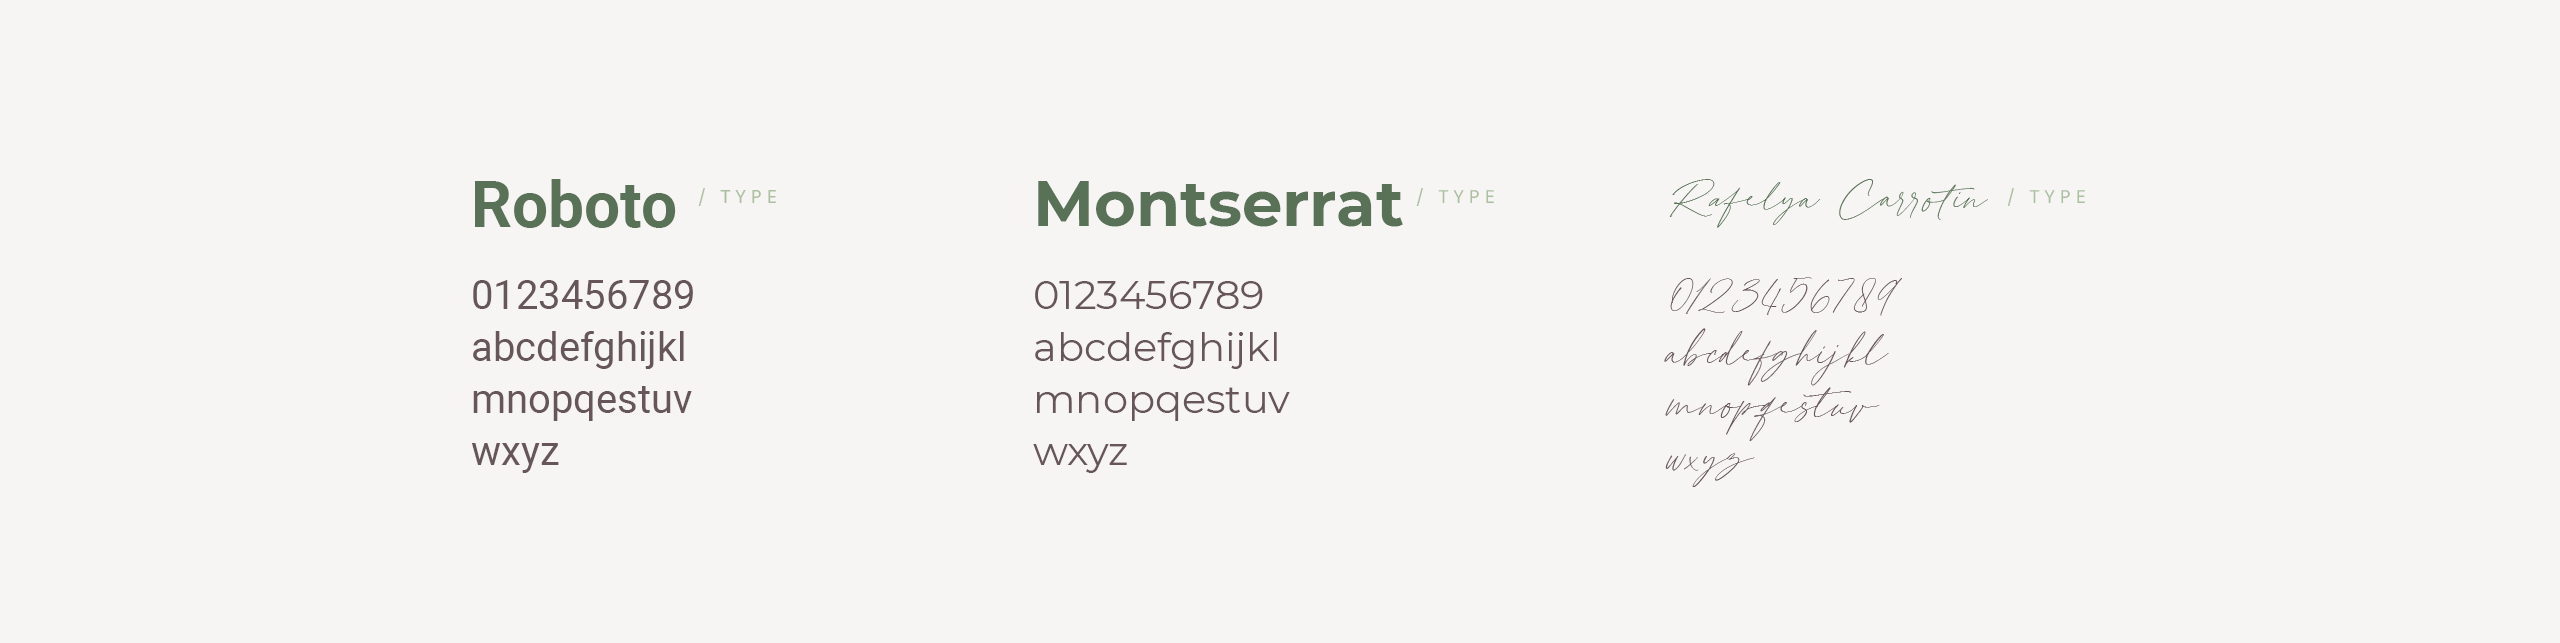 Used font for a skincare company